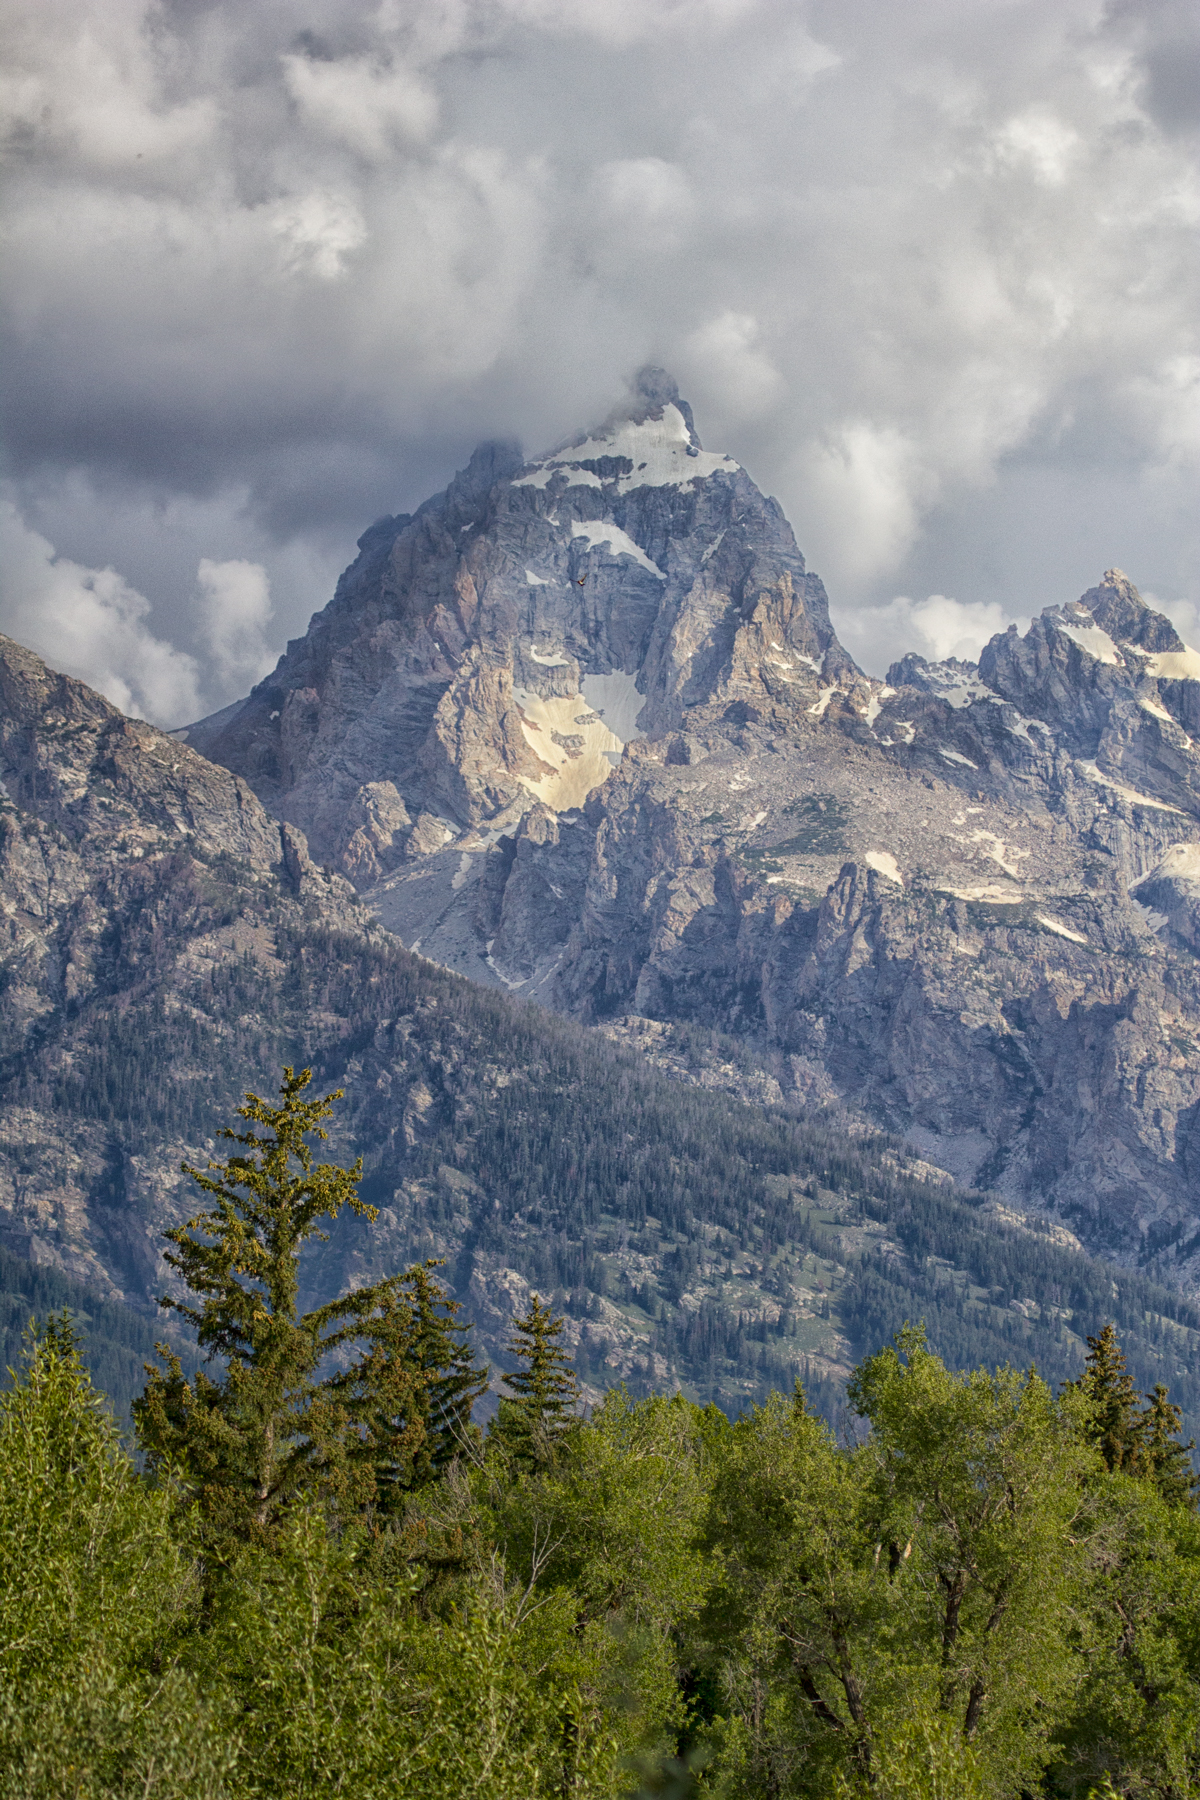 Grand Teton in GTNP